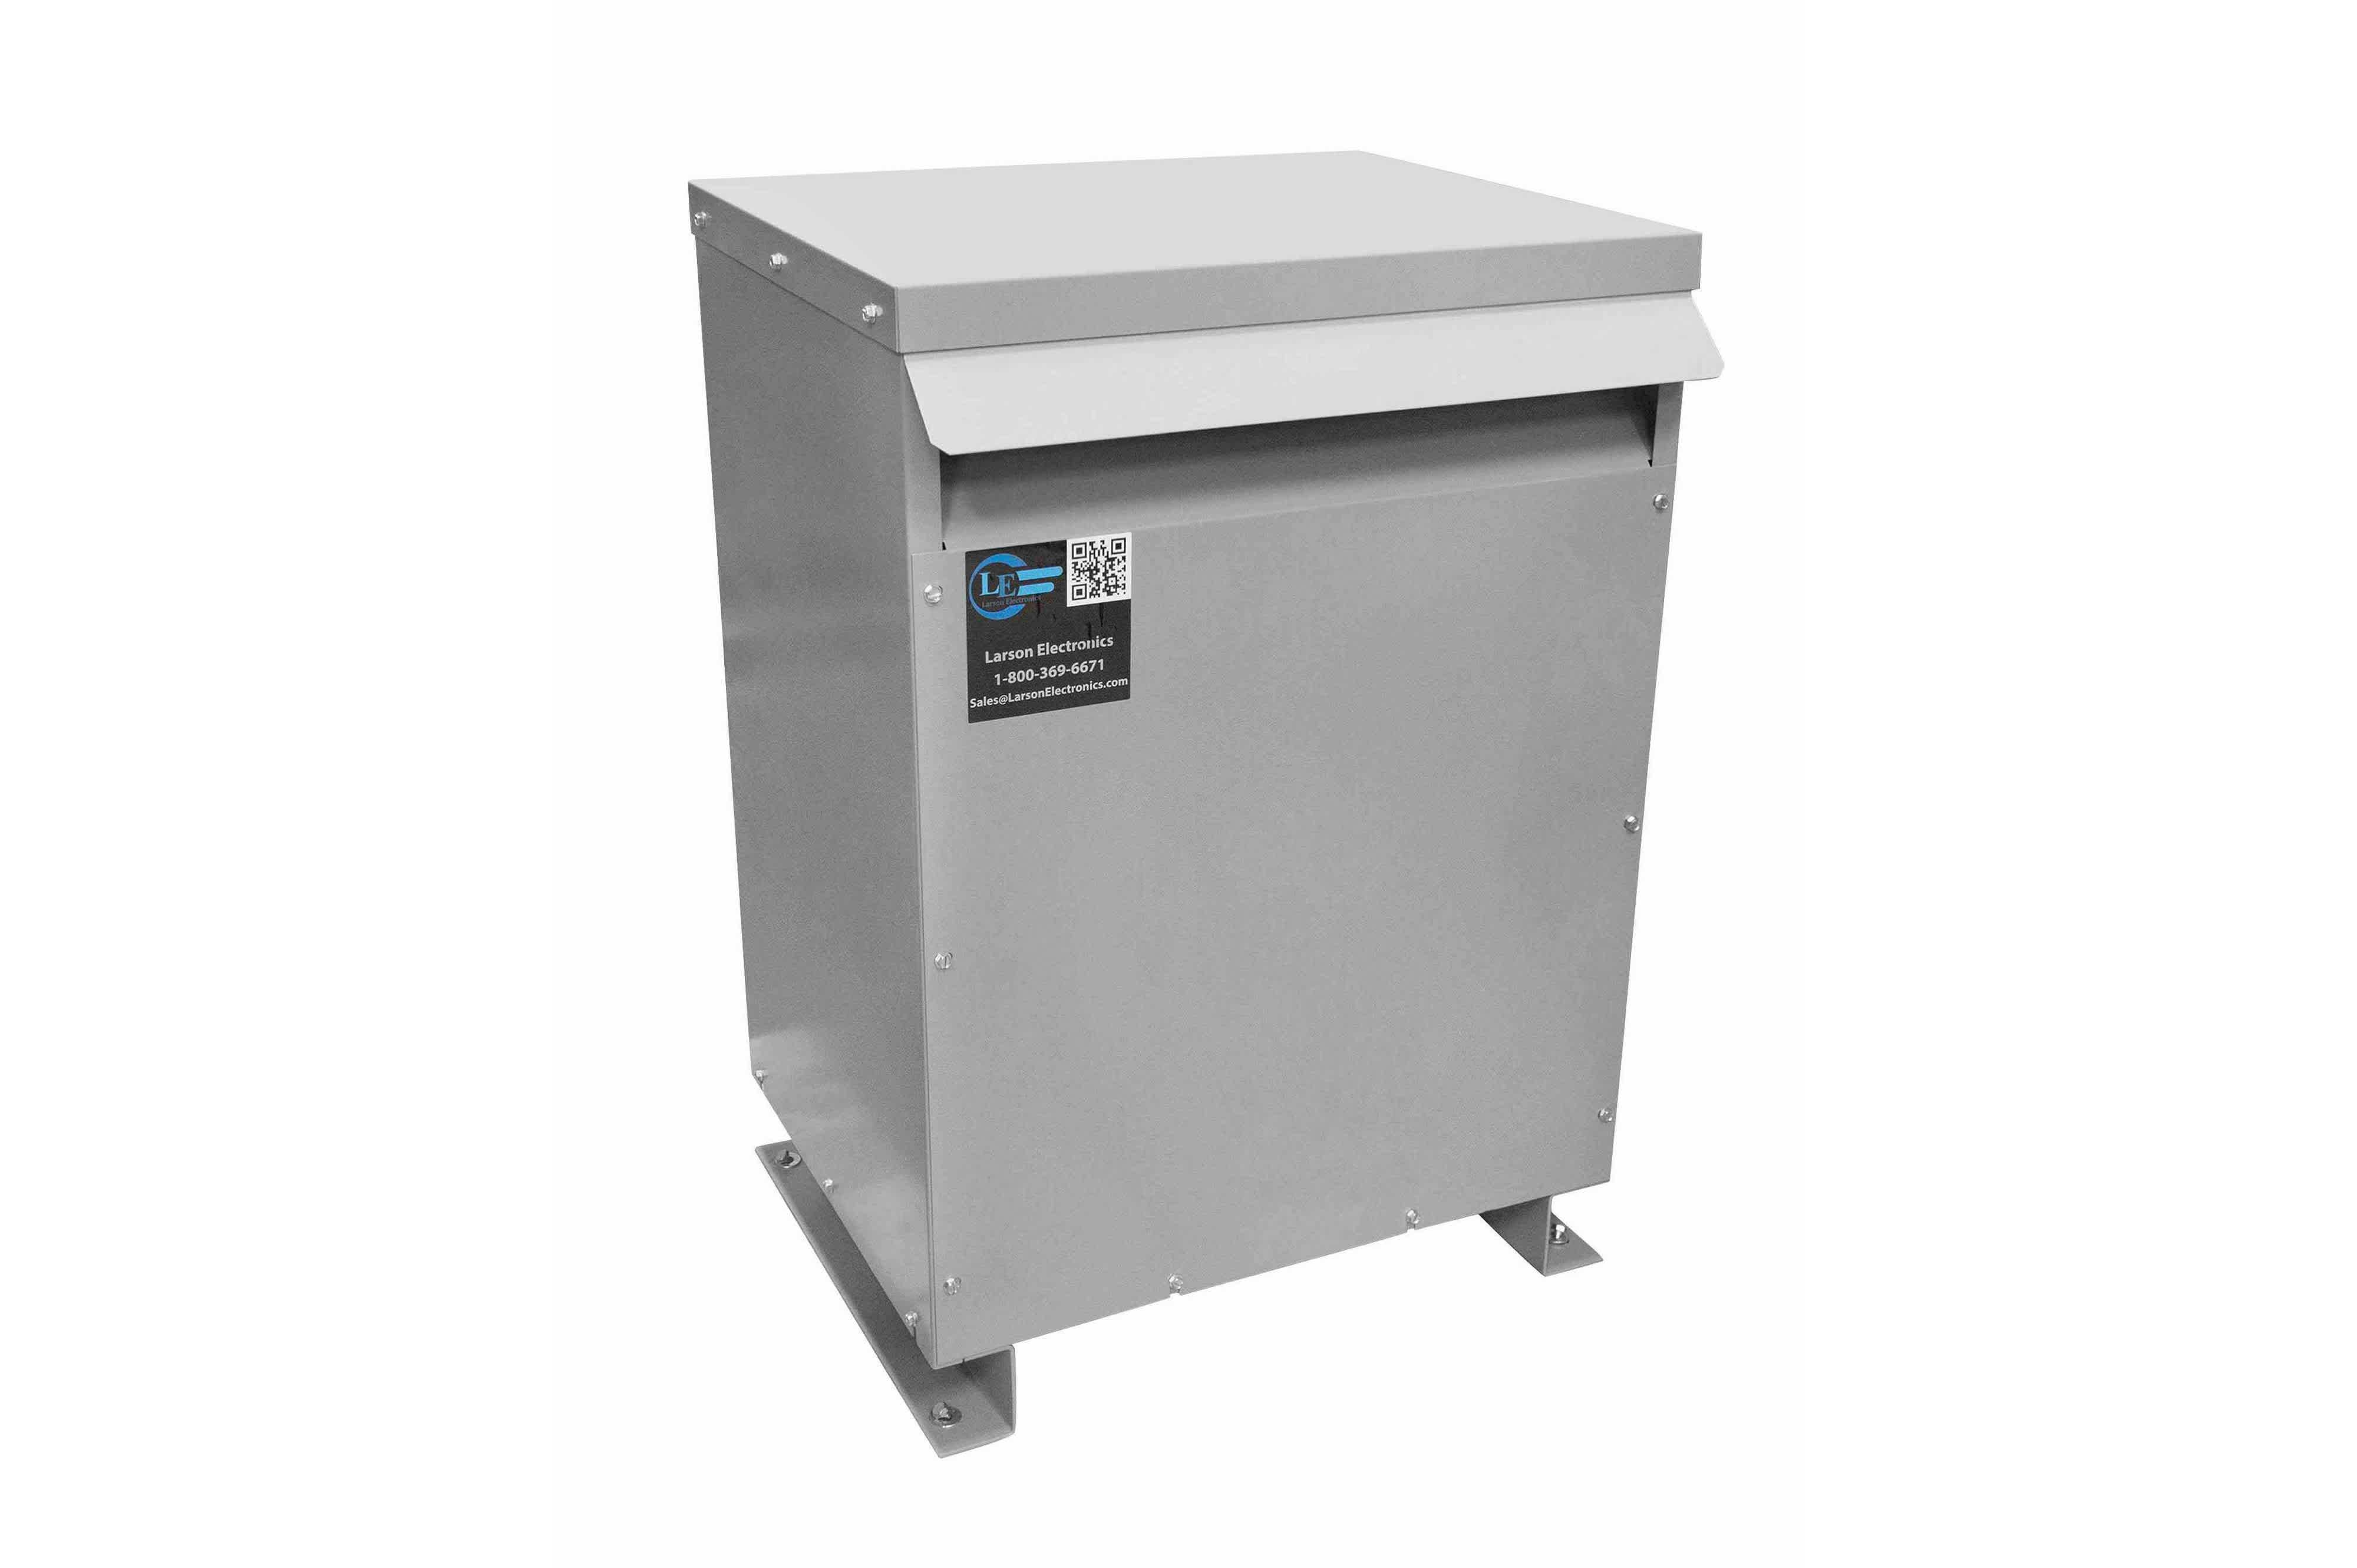 237.5 kVA 3PH Isolation Transformer, 230V Wye Primary, 480Y/277 Wye-N Secondary, N3R, Ventilated, 60 Hz